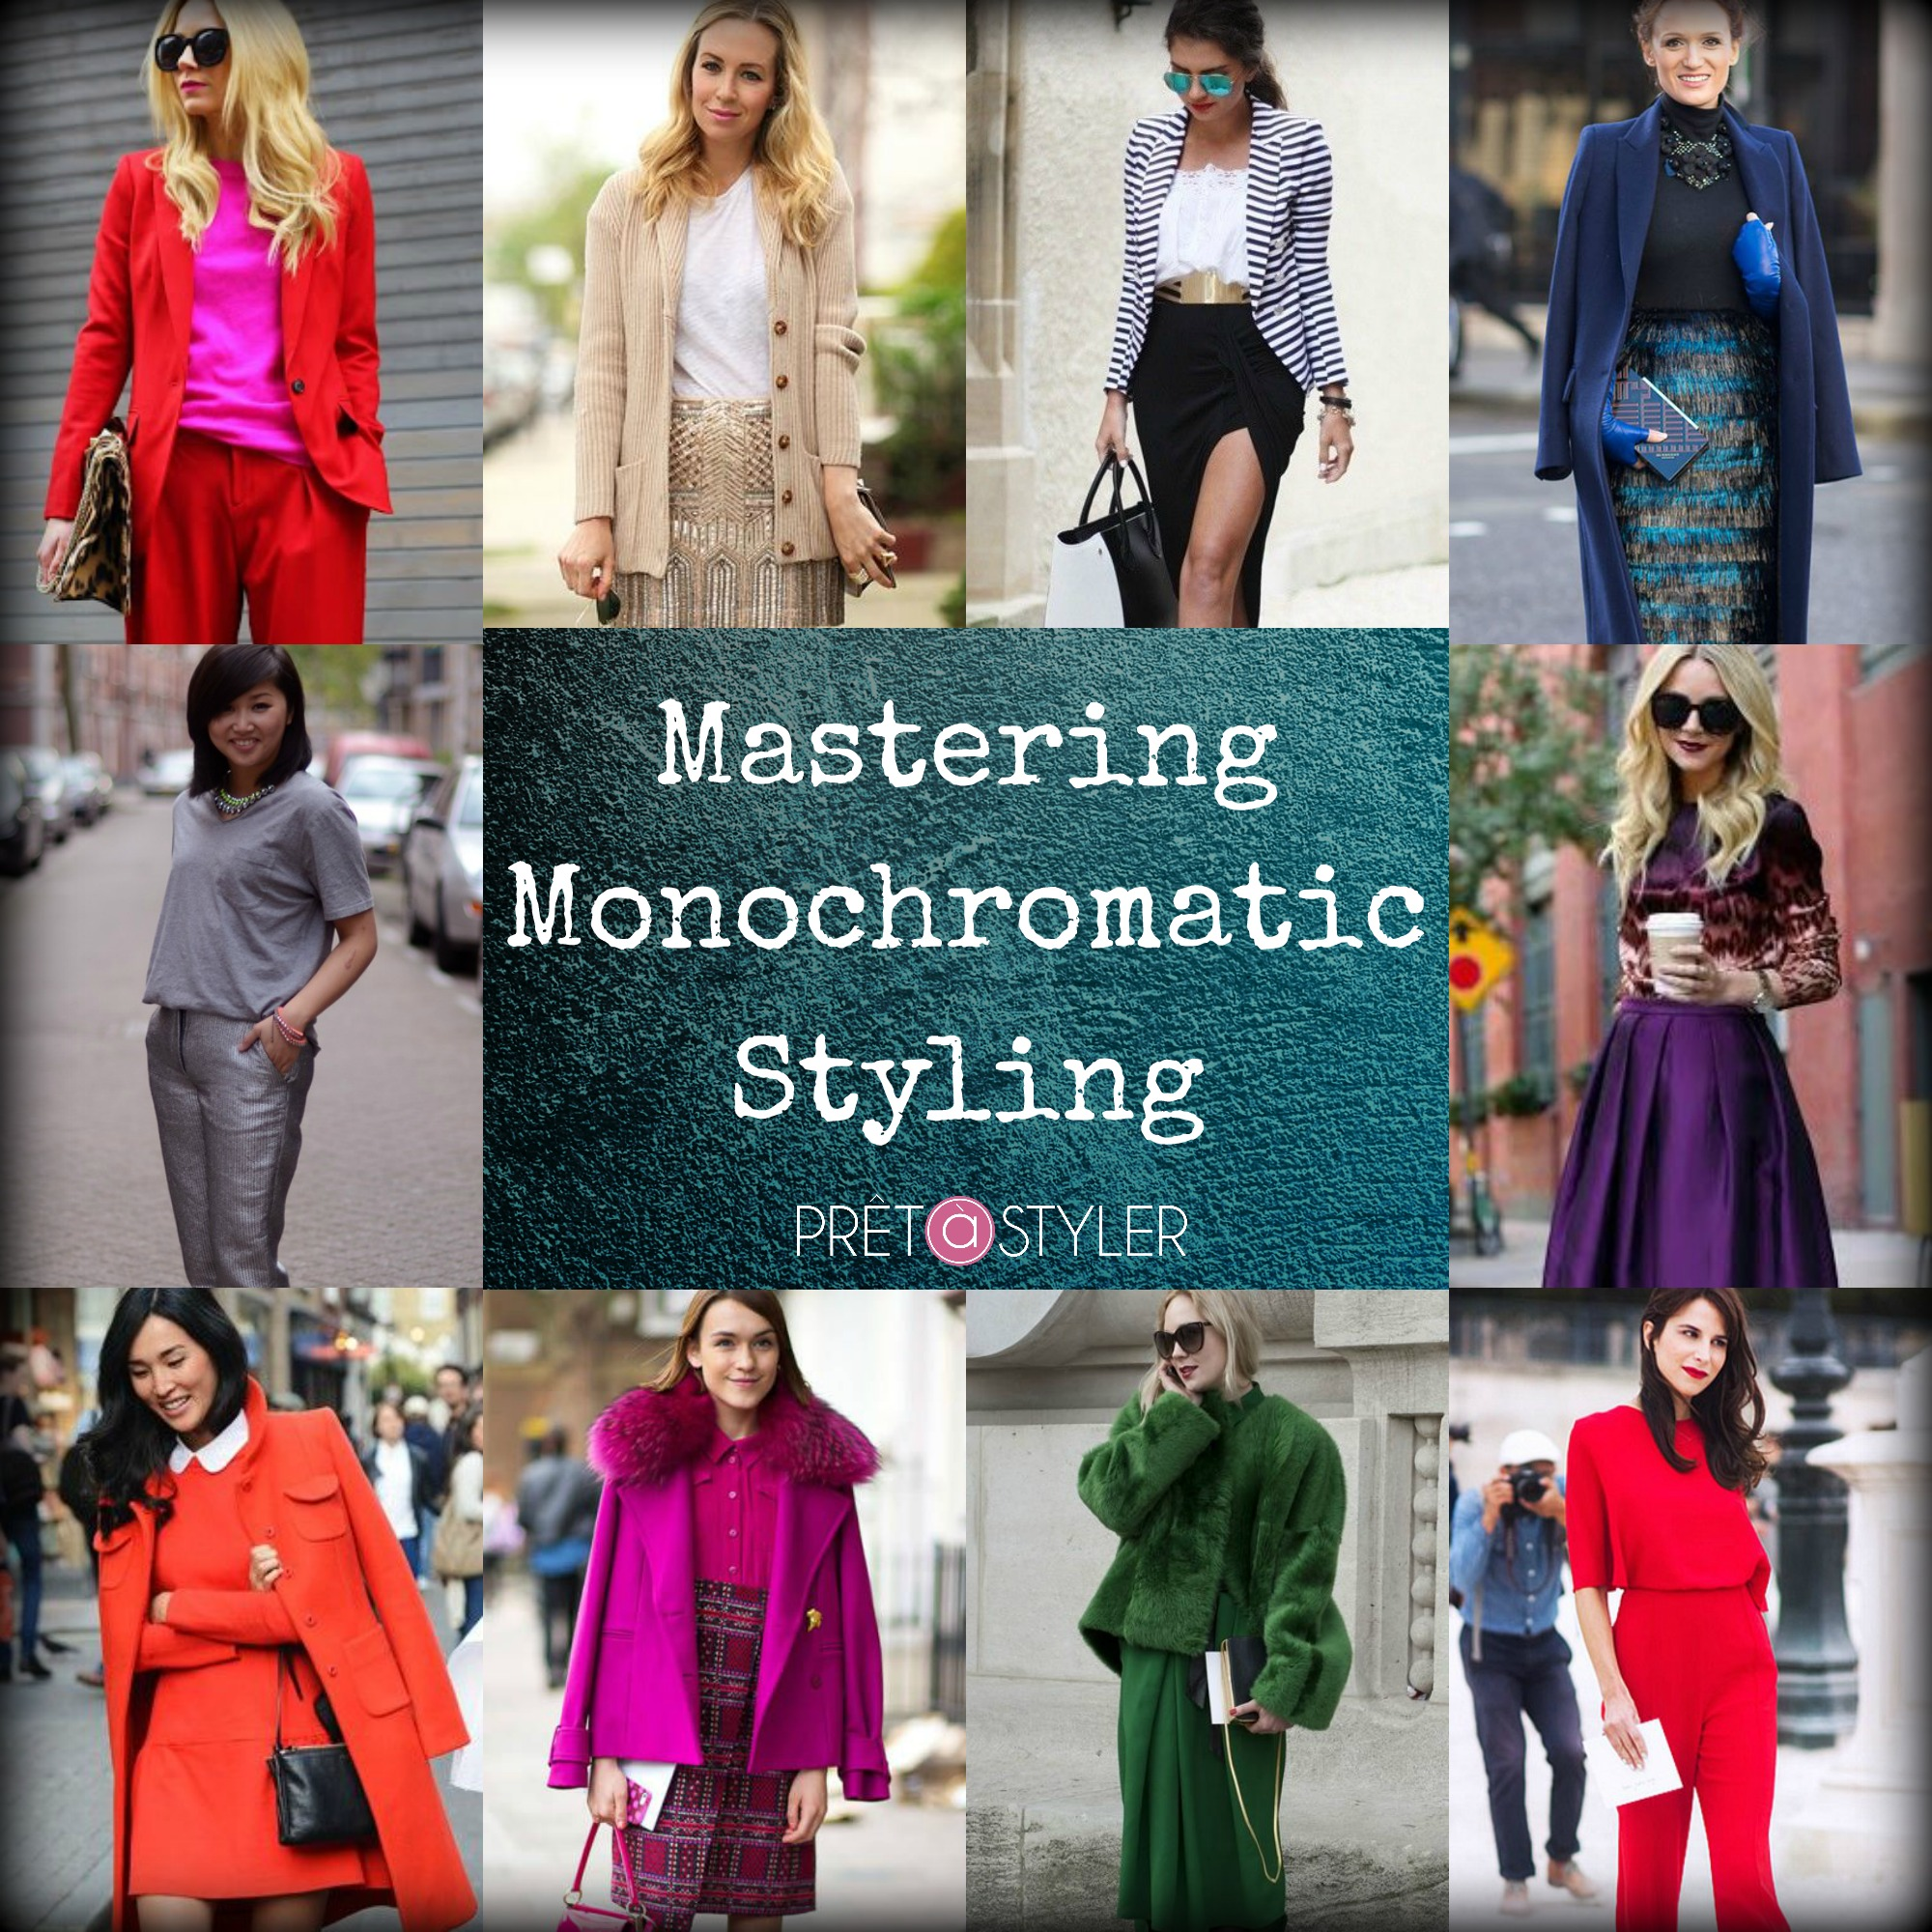 Mastering Monochromatic Styling